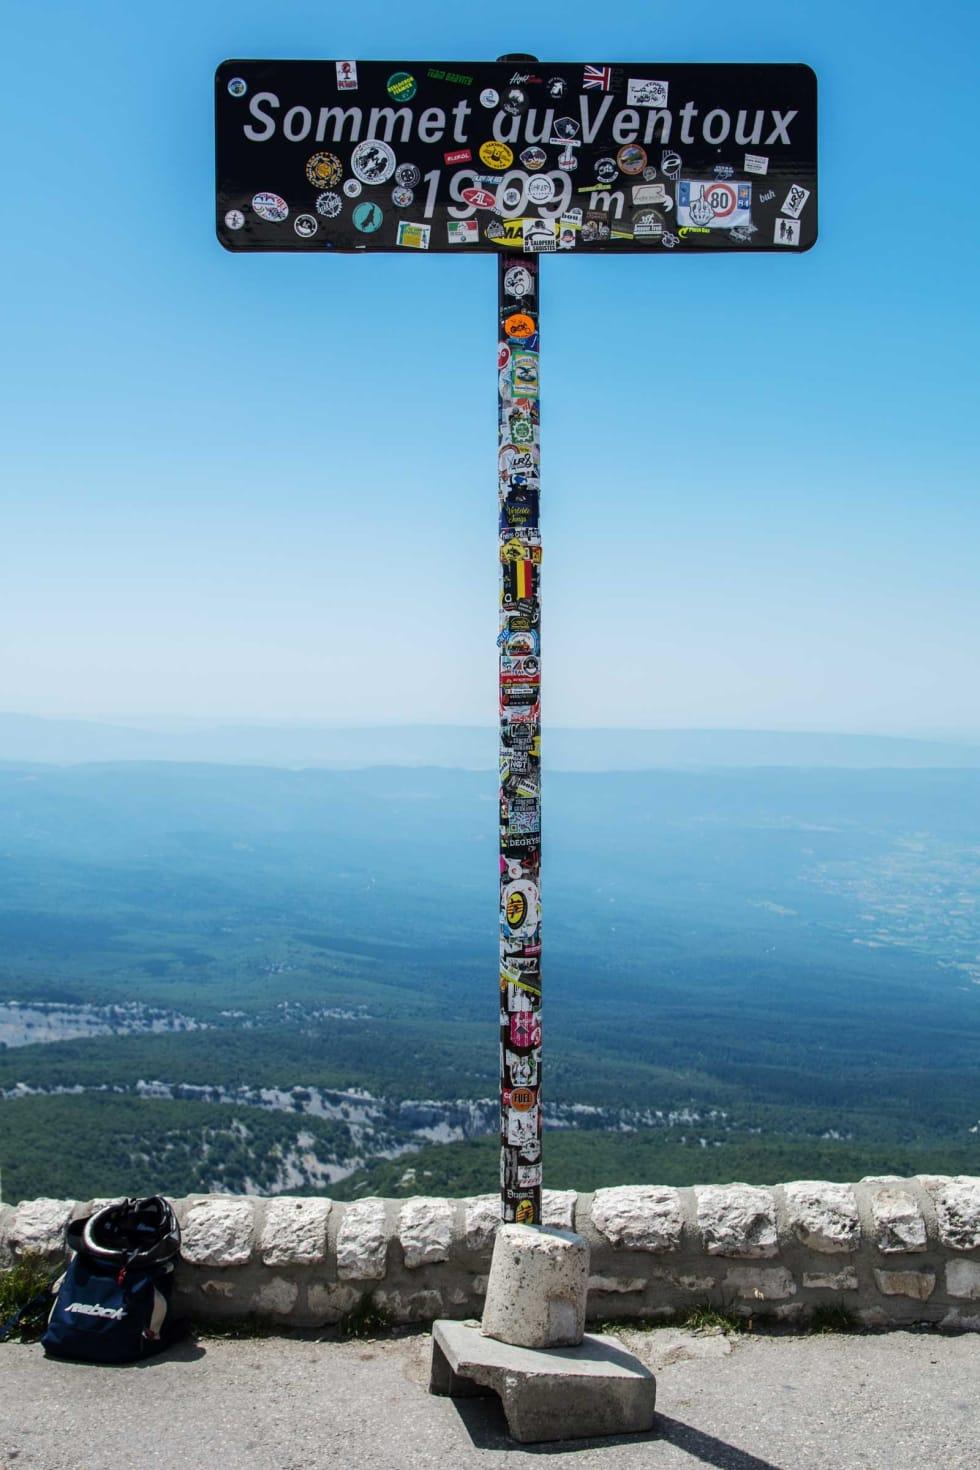 TOPPUNKT: Mont Ventoux ruver 1909 meter over havet og er det høyeste fjellet i Provence.